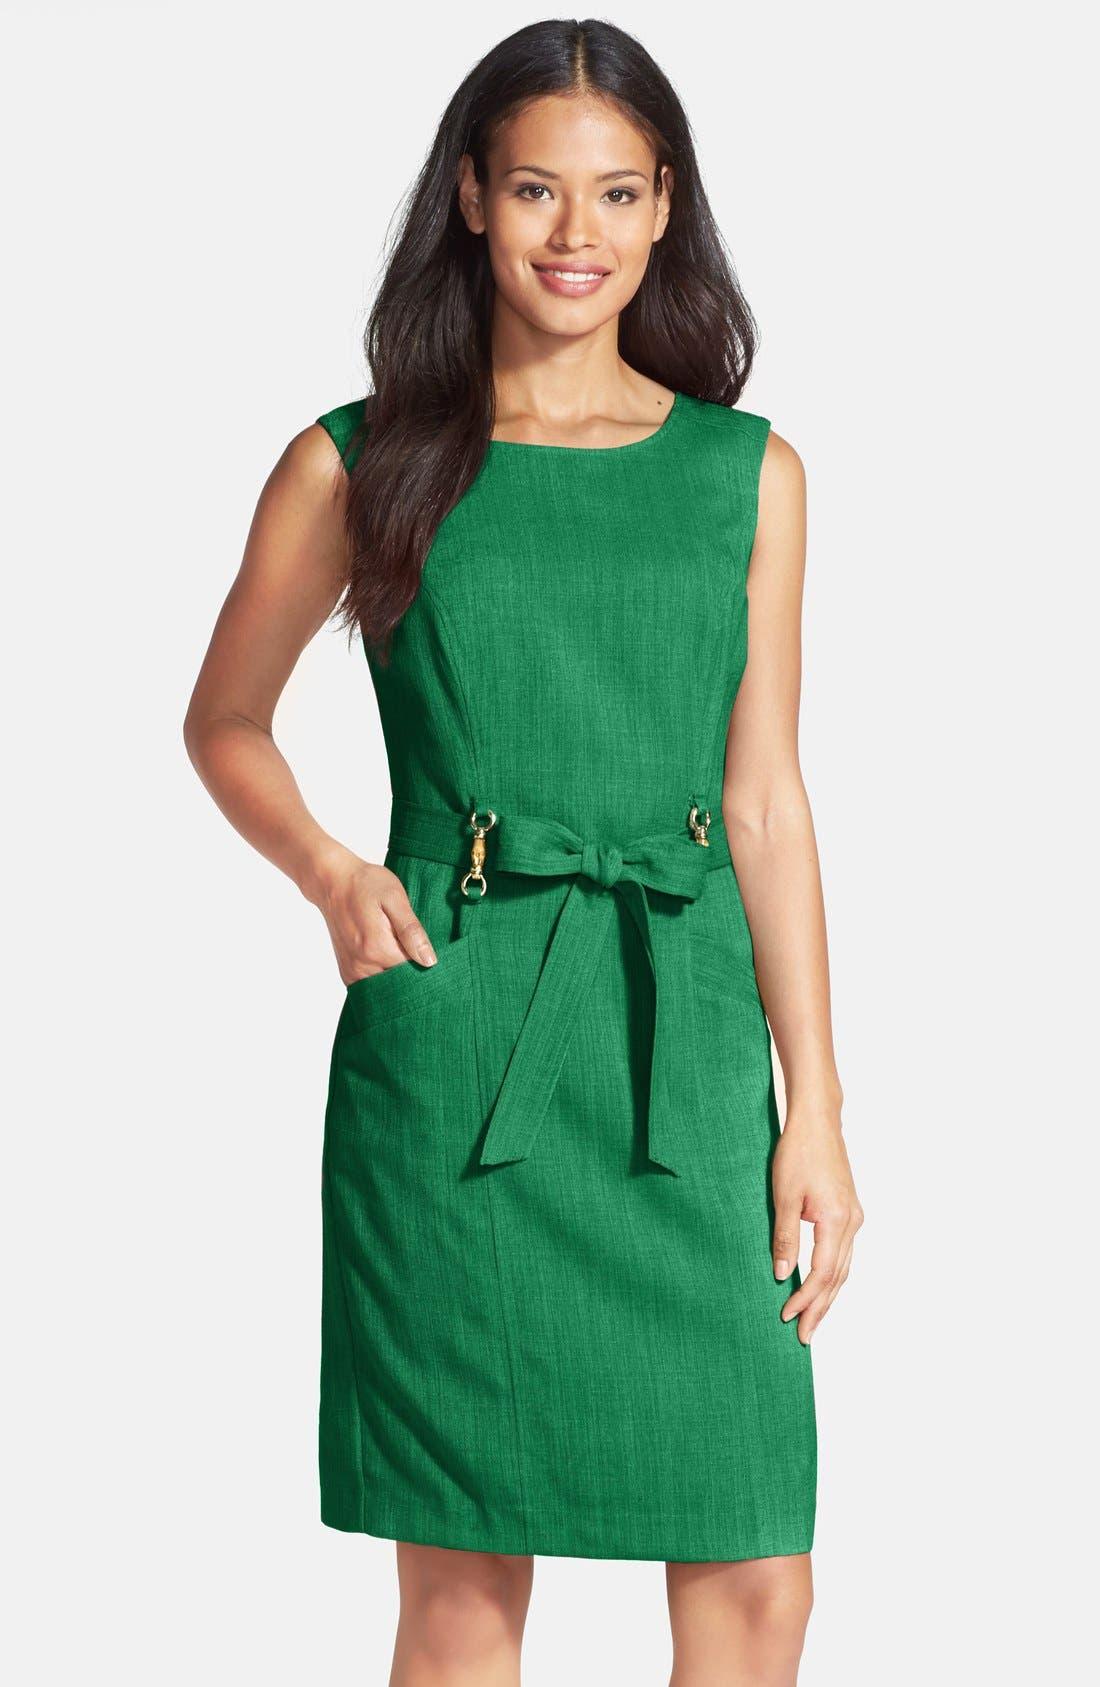 Alternate Image 1 Selected - Ellen Tracy 'Kenya' Sleeveless Dress